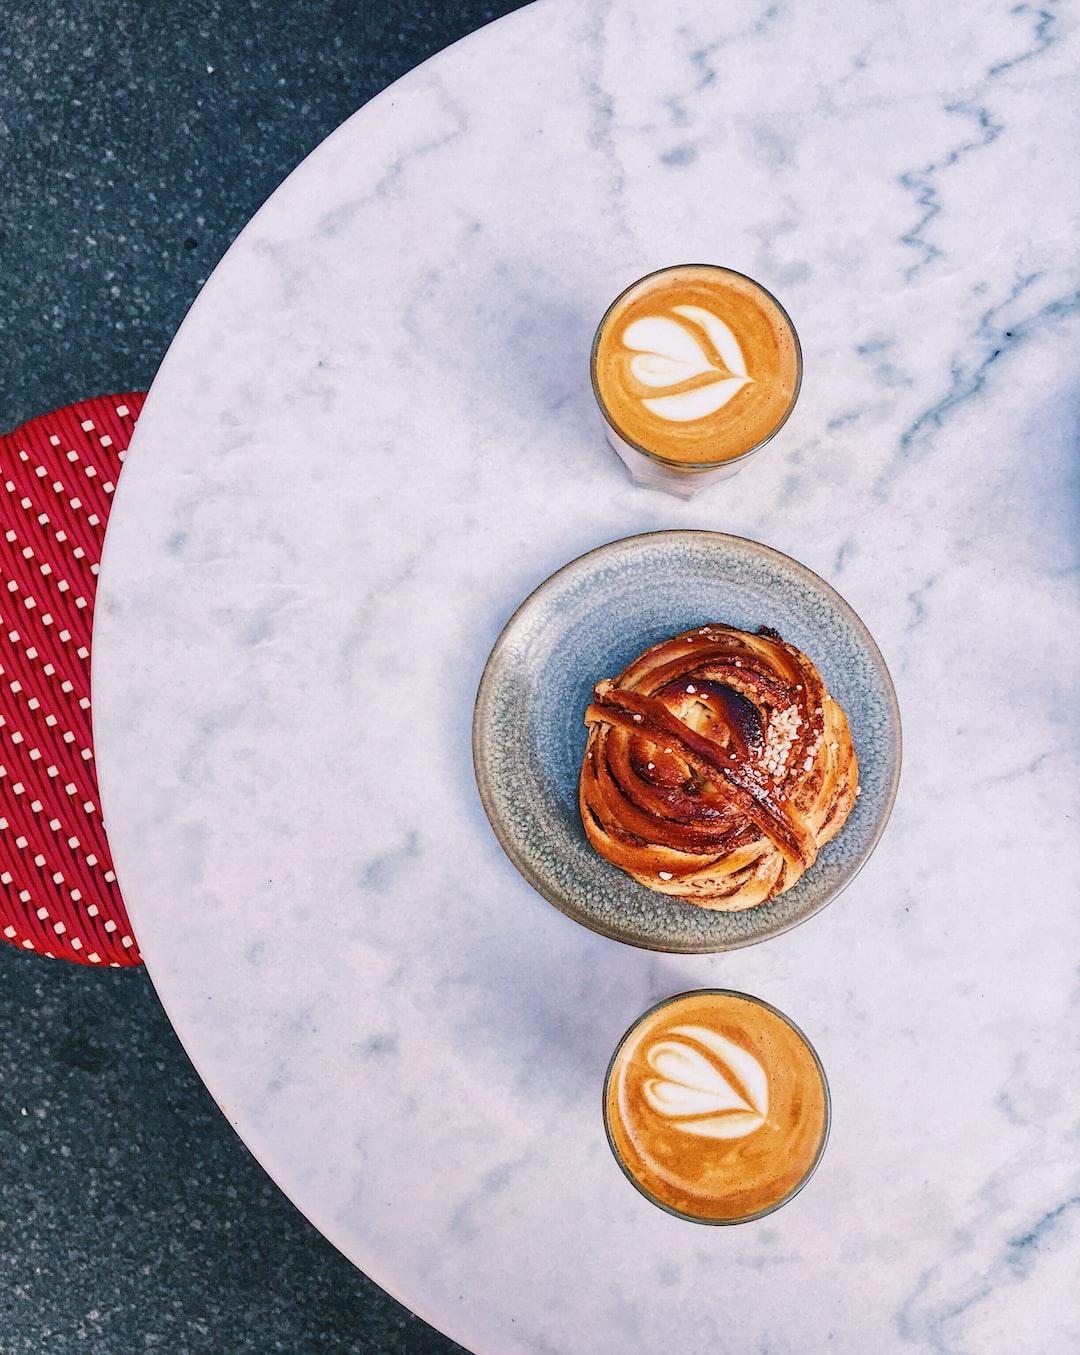 Fica time with cortado coffee and a cinnamon bun at Café & Bageri Pascal in Södermalm, Sotckholm. June 2019.